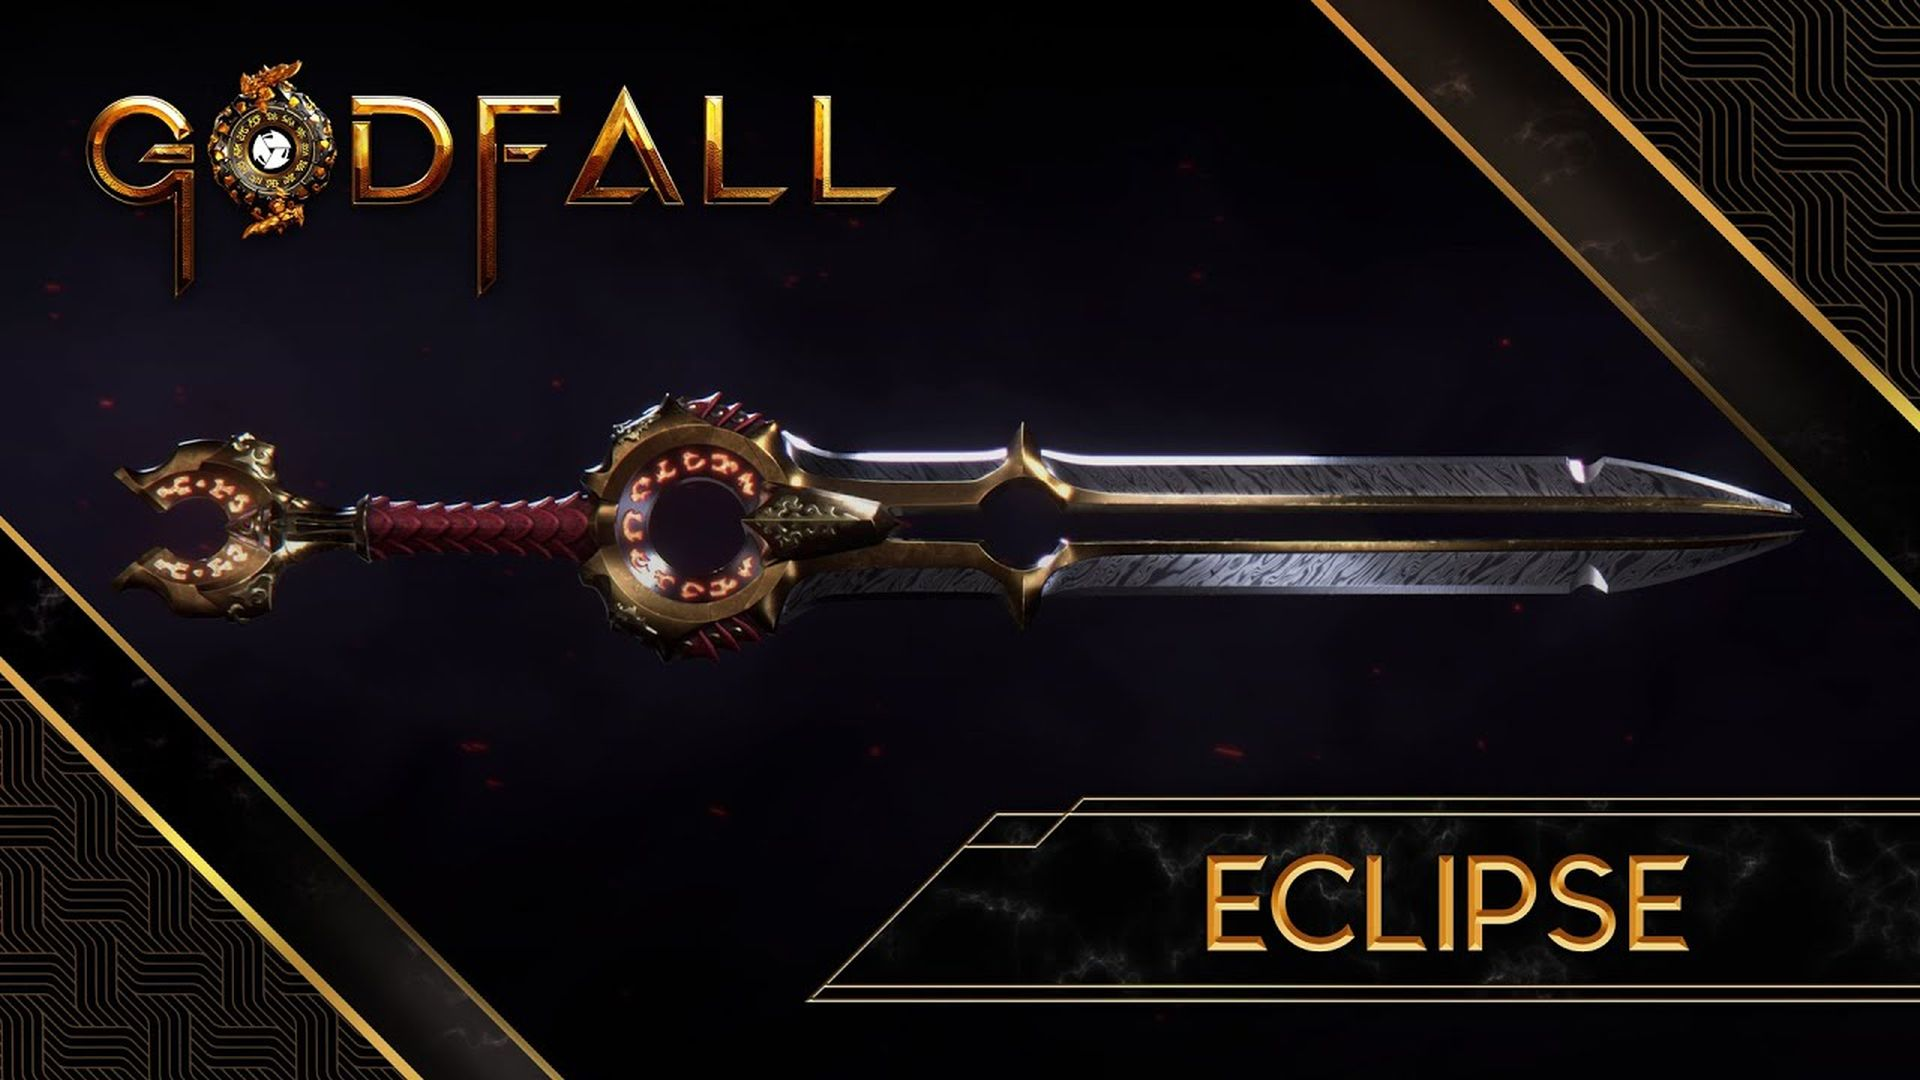 Godfall Eclipse